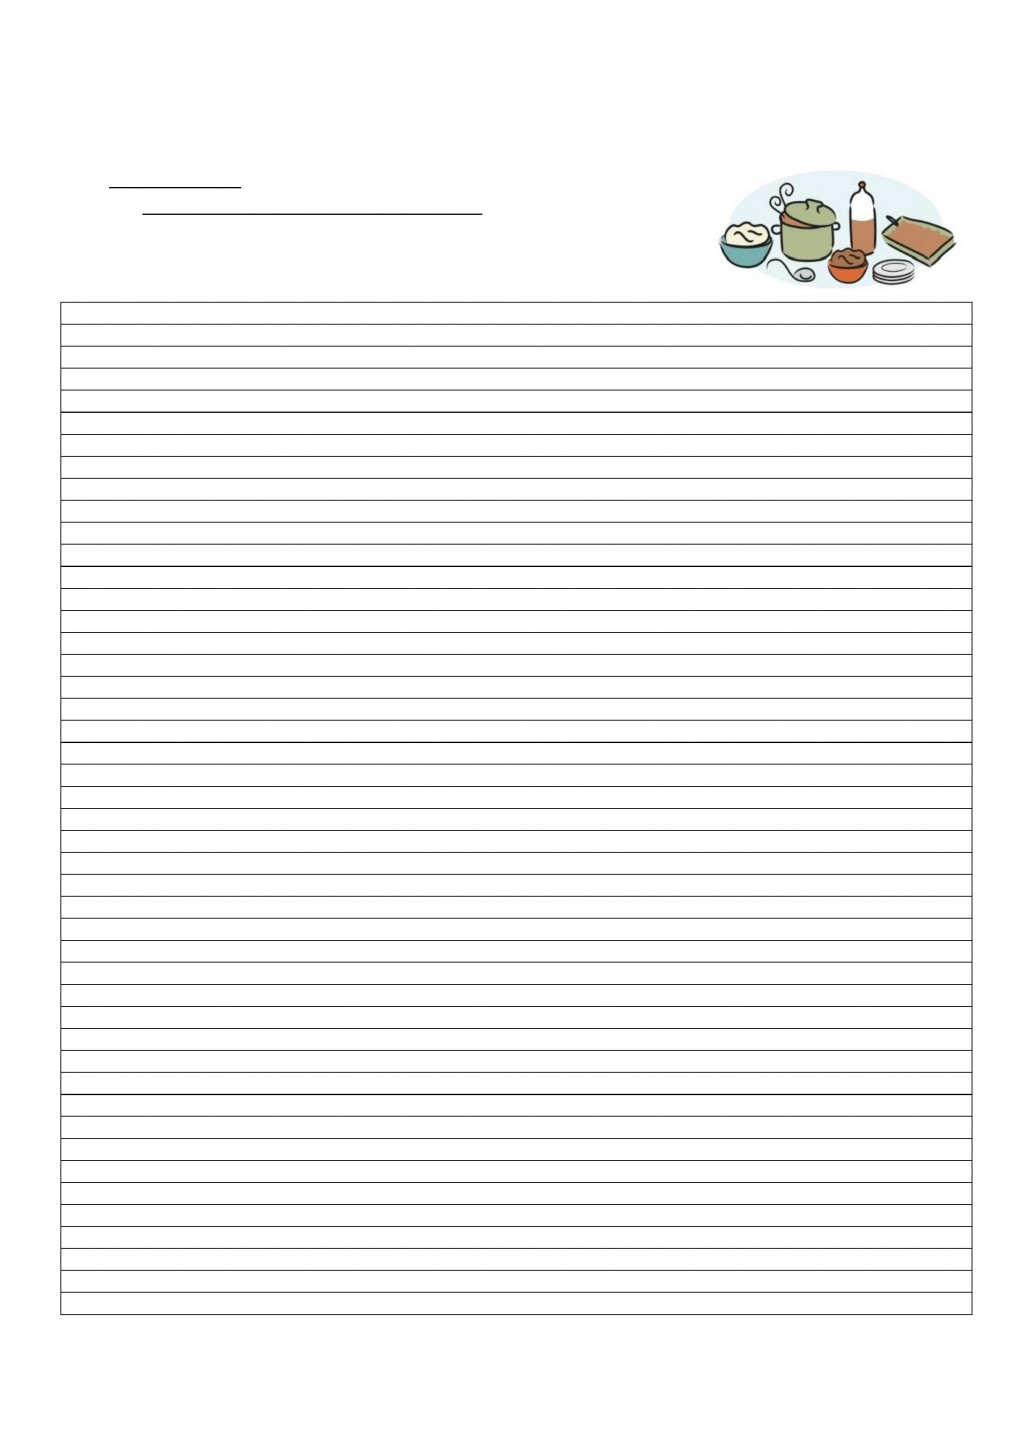 003 Breathtaking Potluck Sign Up Sheet Template Example  Pdf Google Doc Free PrintableLarge